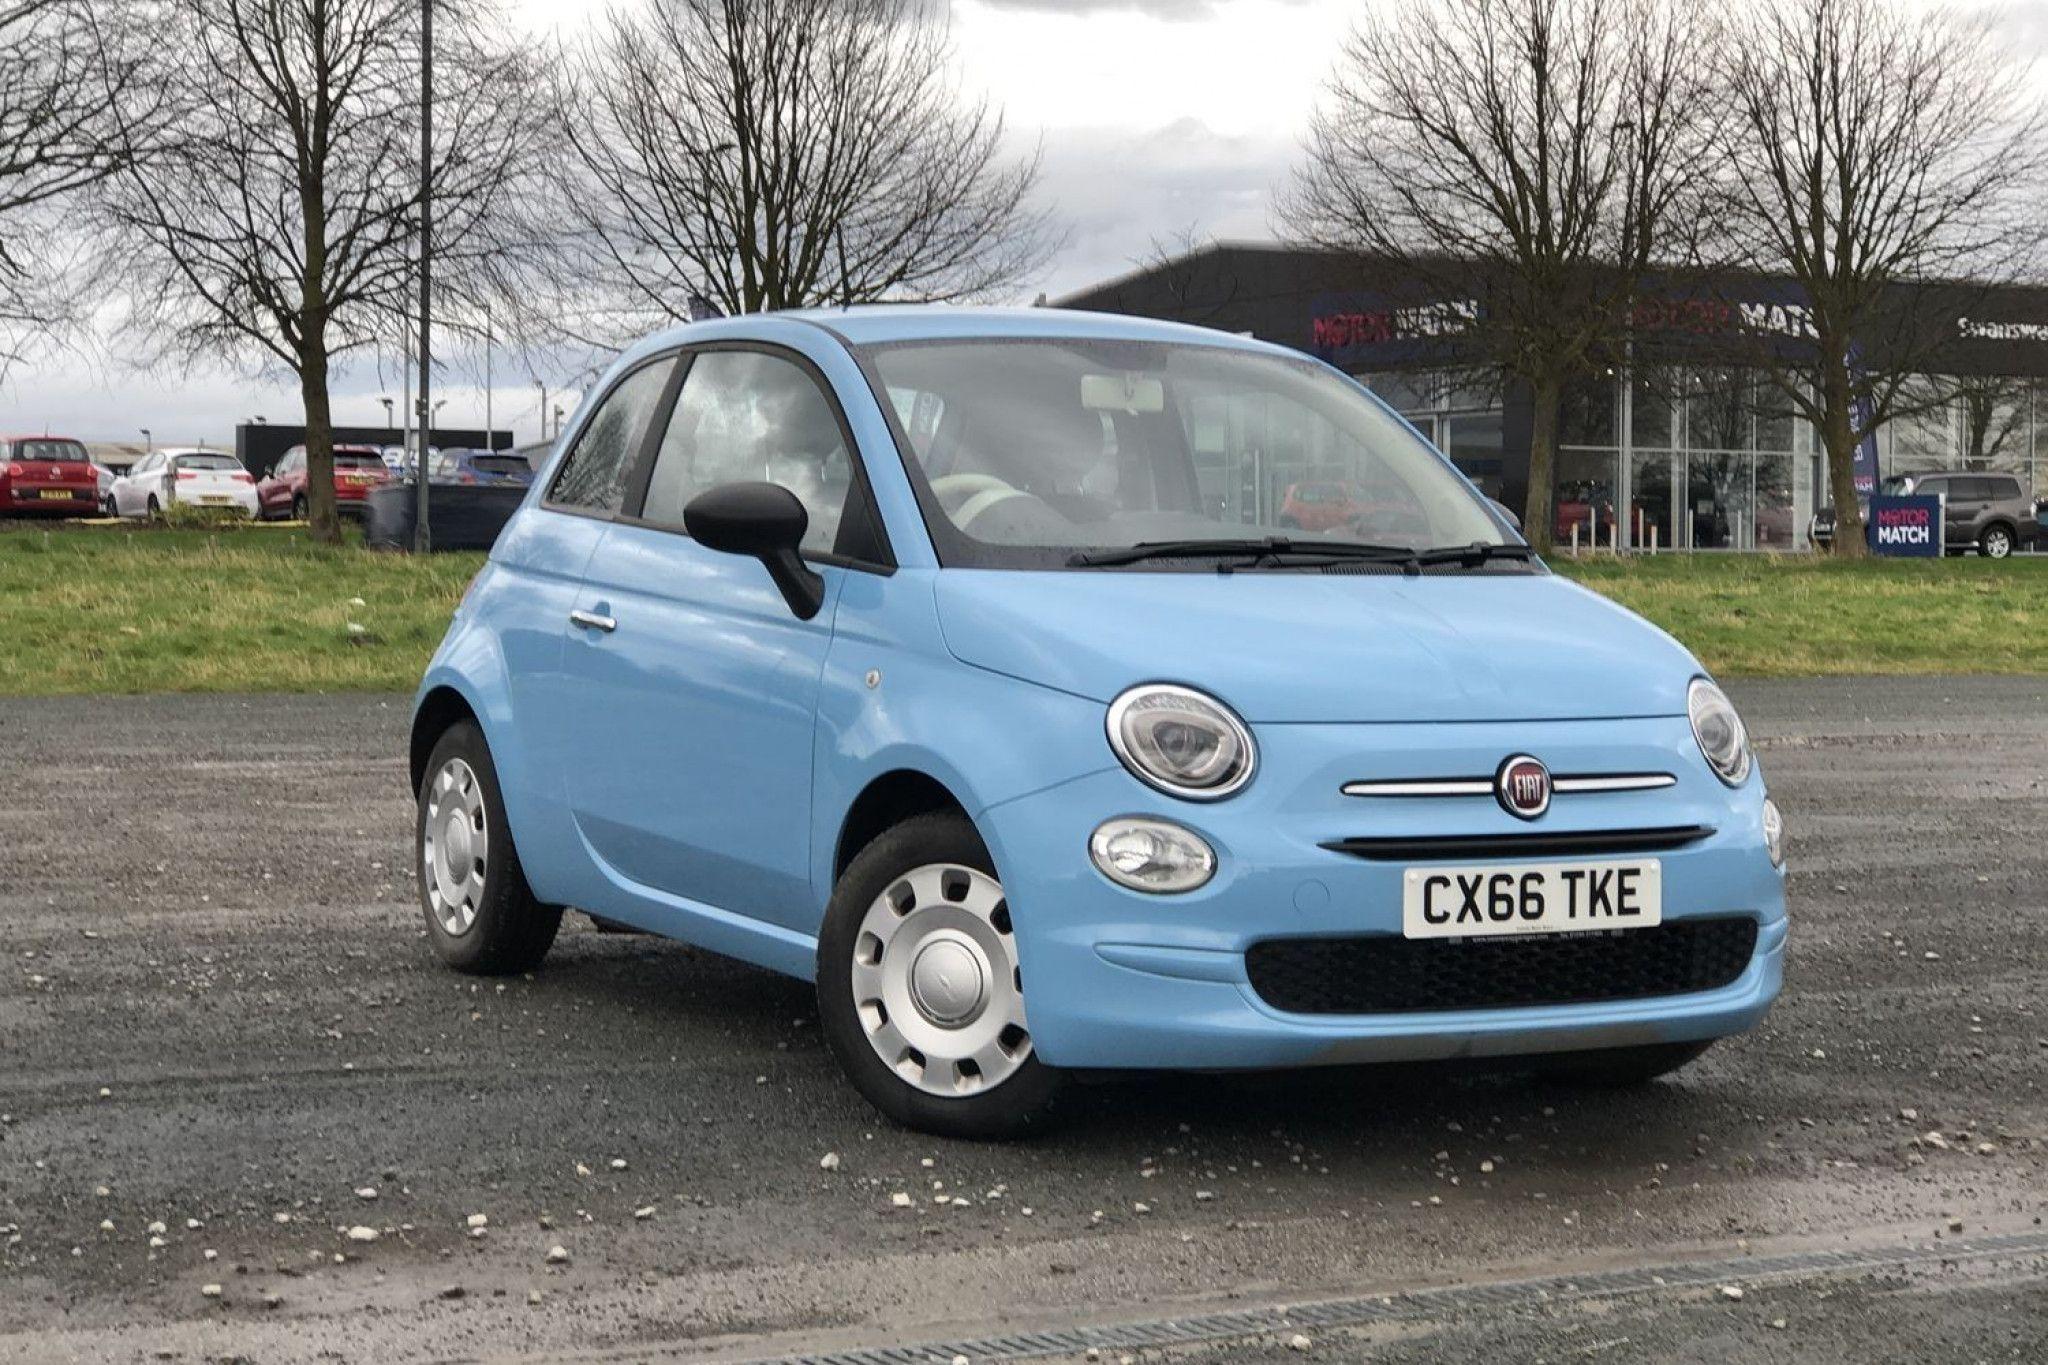 Fiat 500 1 2 Pop 3dr In 2020 Fiat 500 Fiat Pop